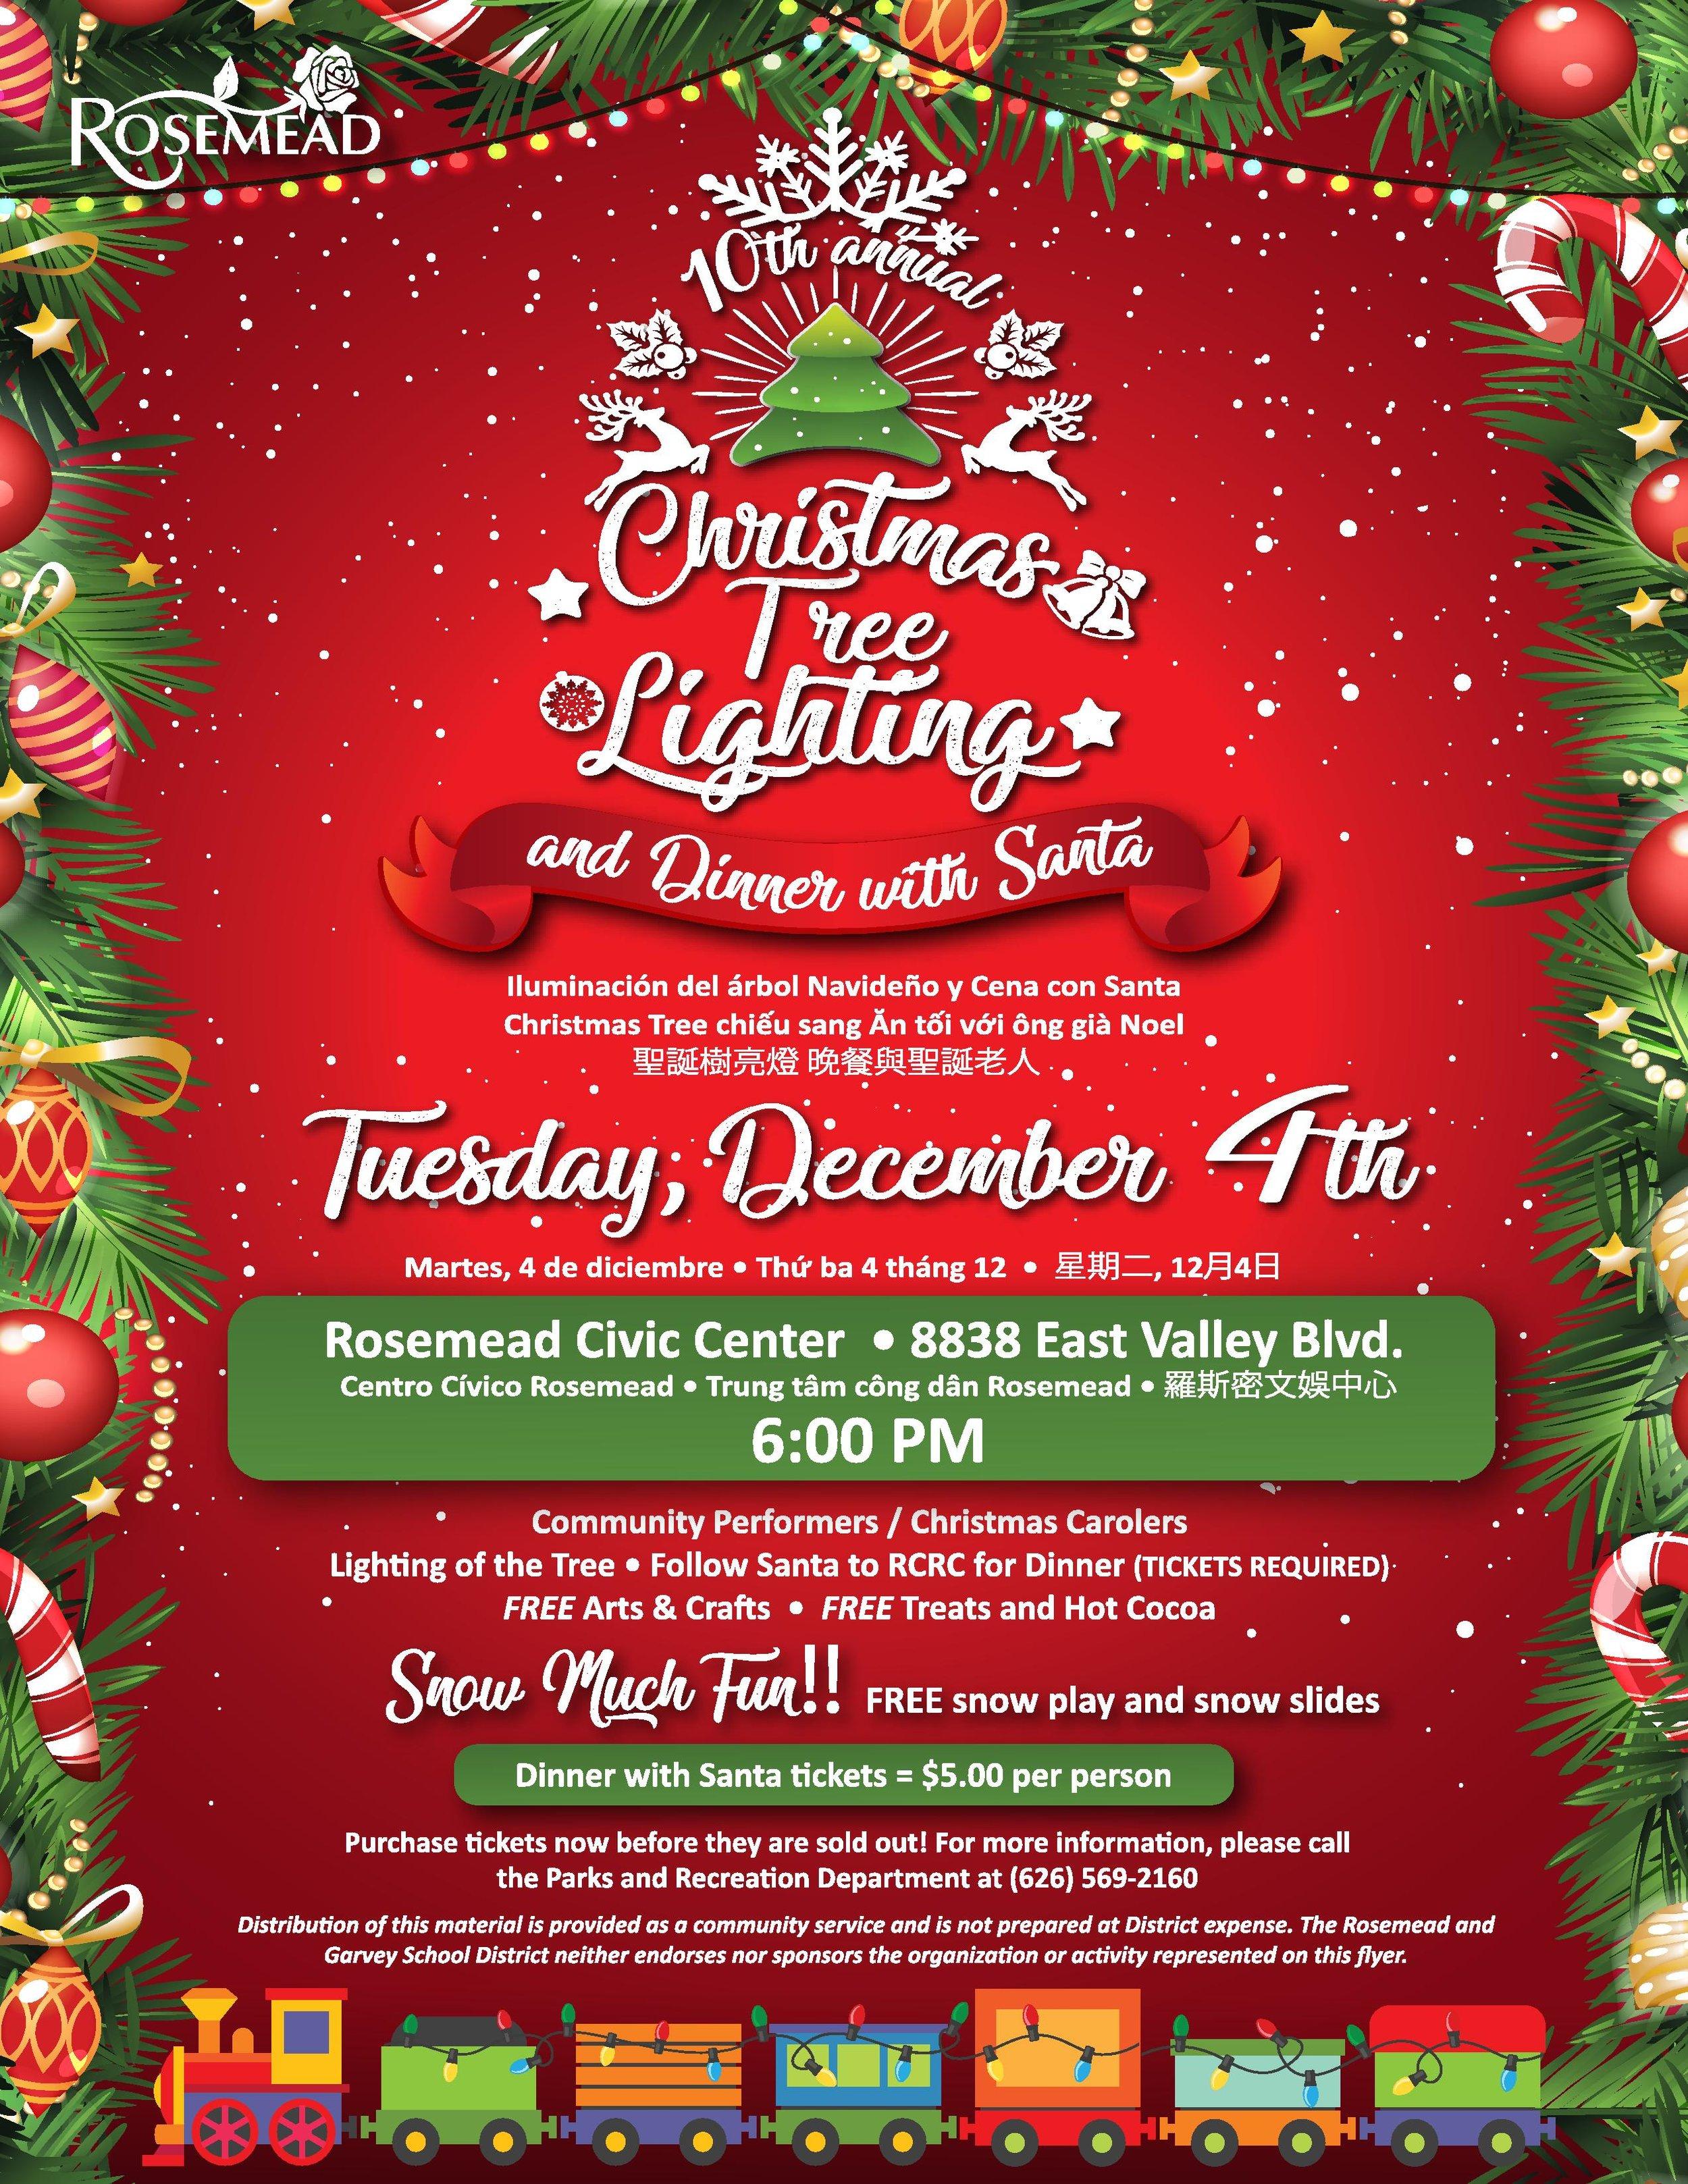 christmas tree lighting and dinner with santa - December 4th, 2018